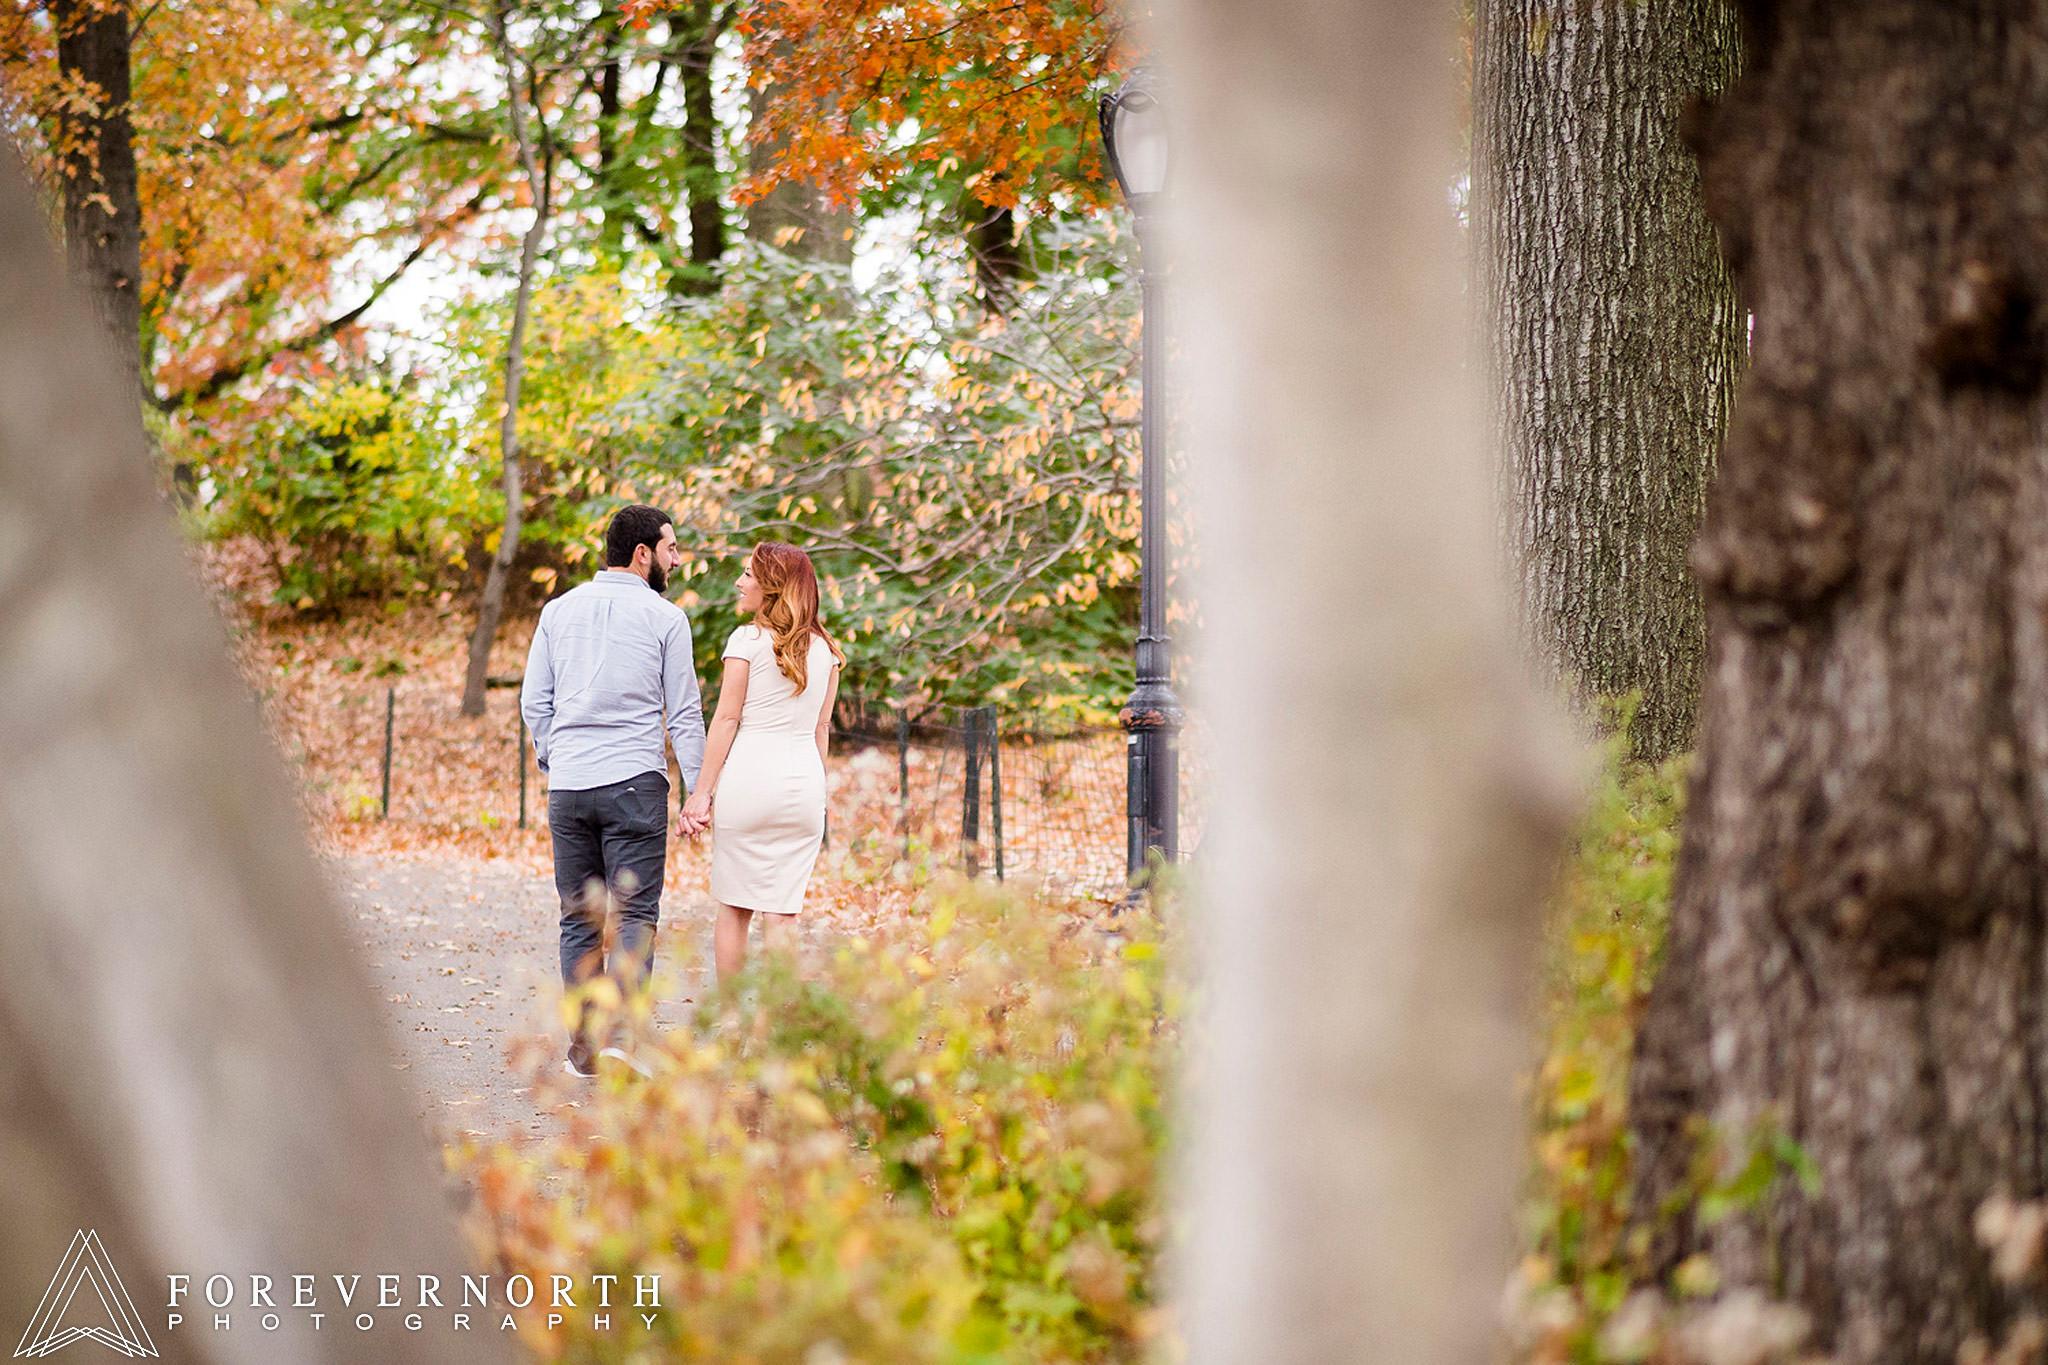 Giangrande-Central-Park-New-York-Engagement-Photos-12.JPG